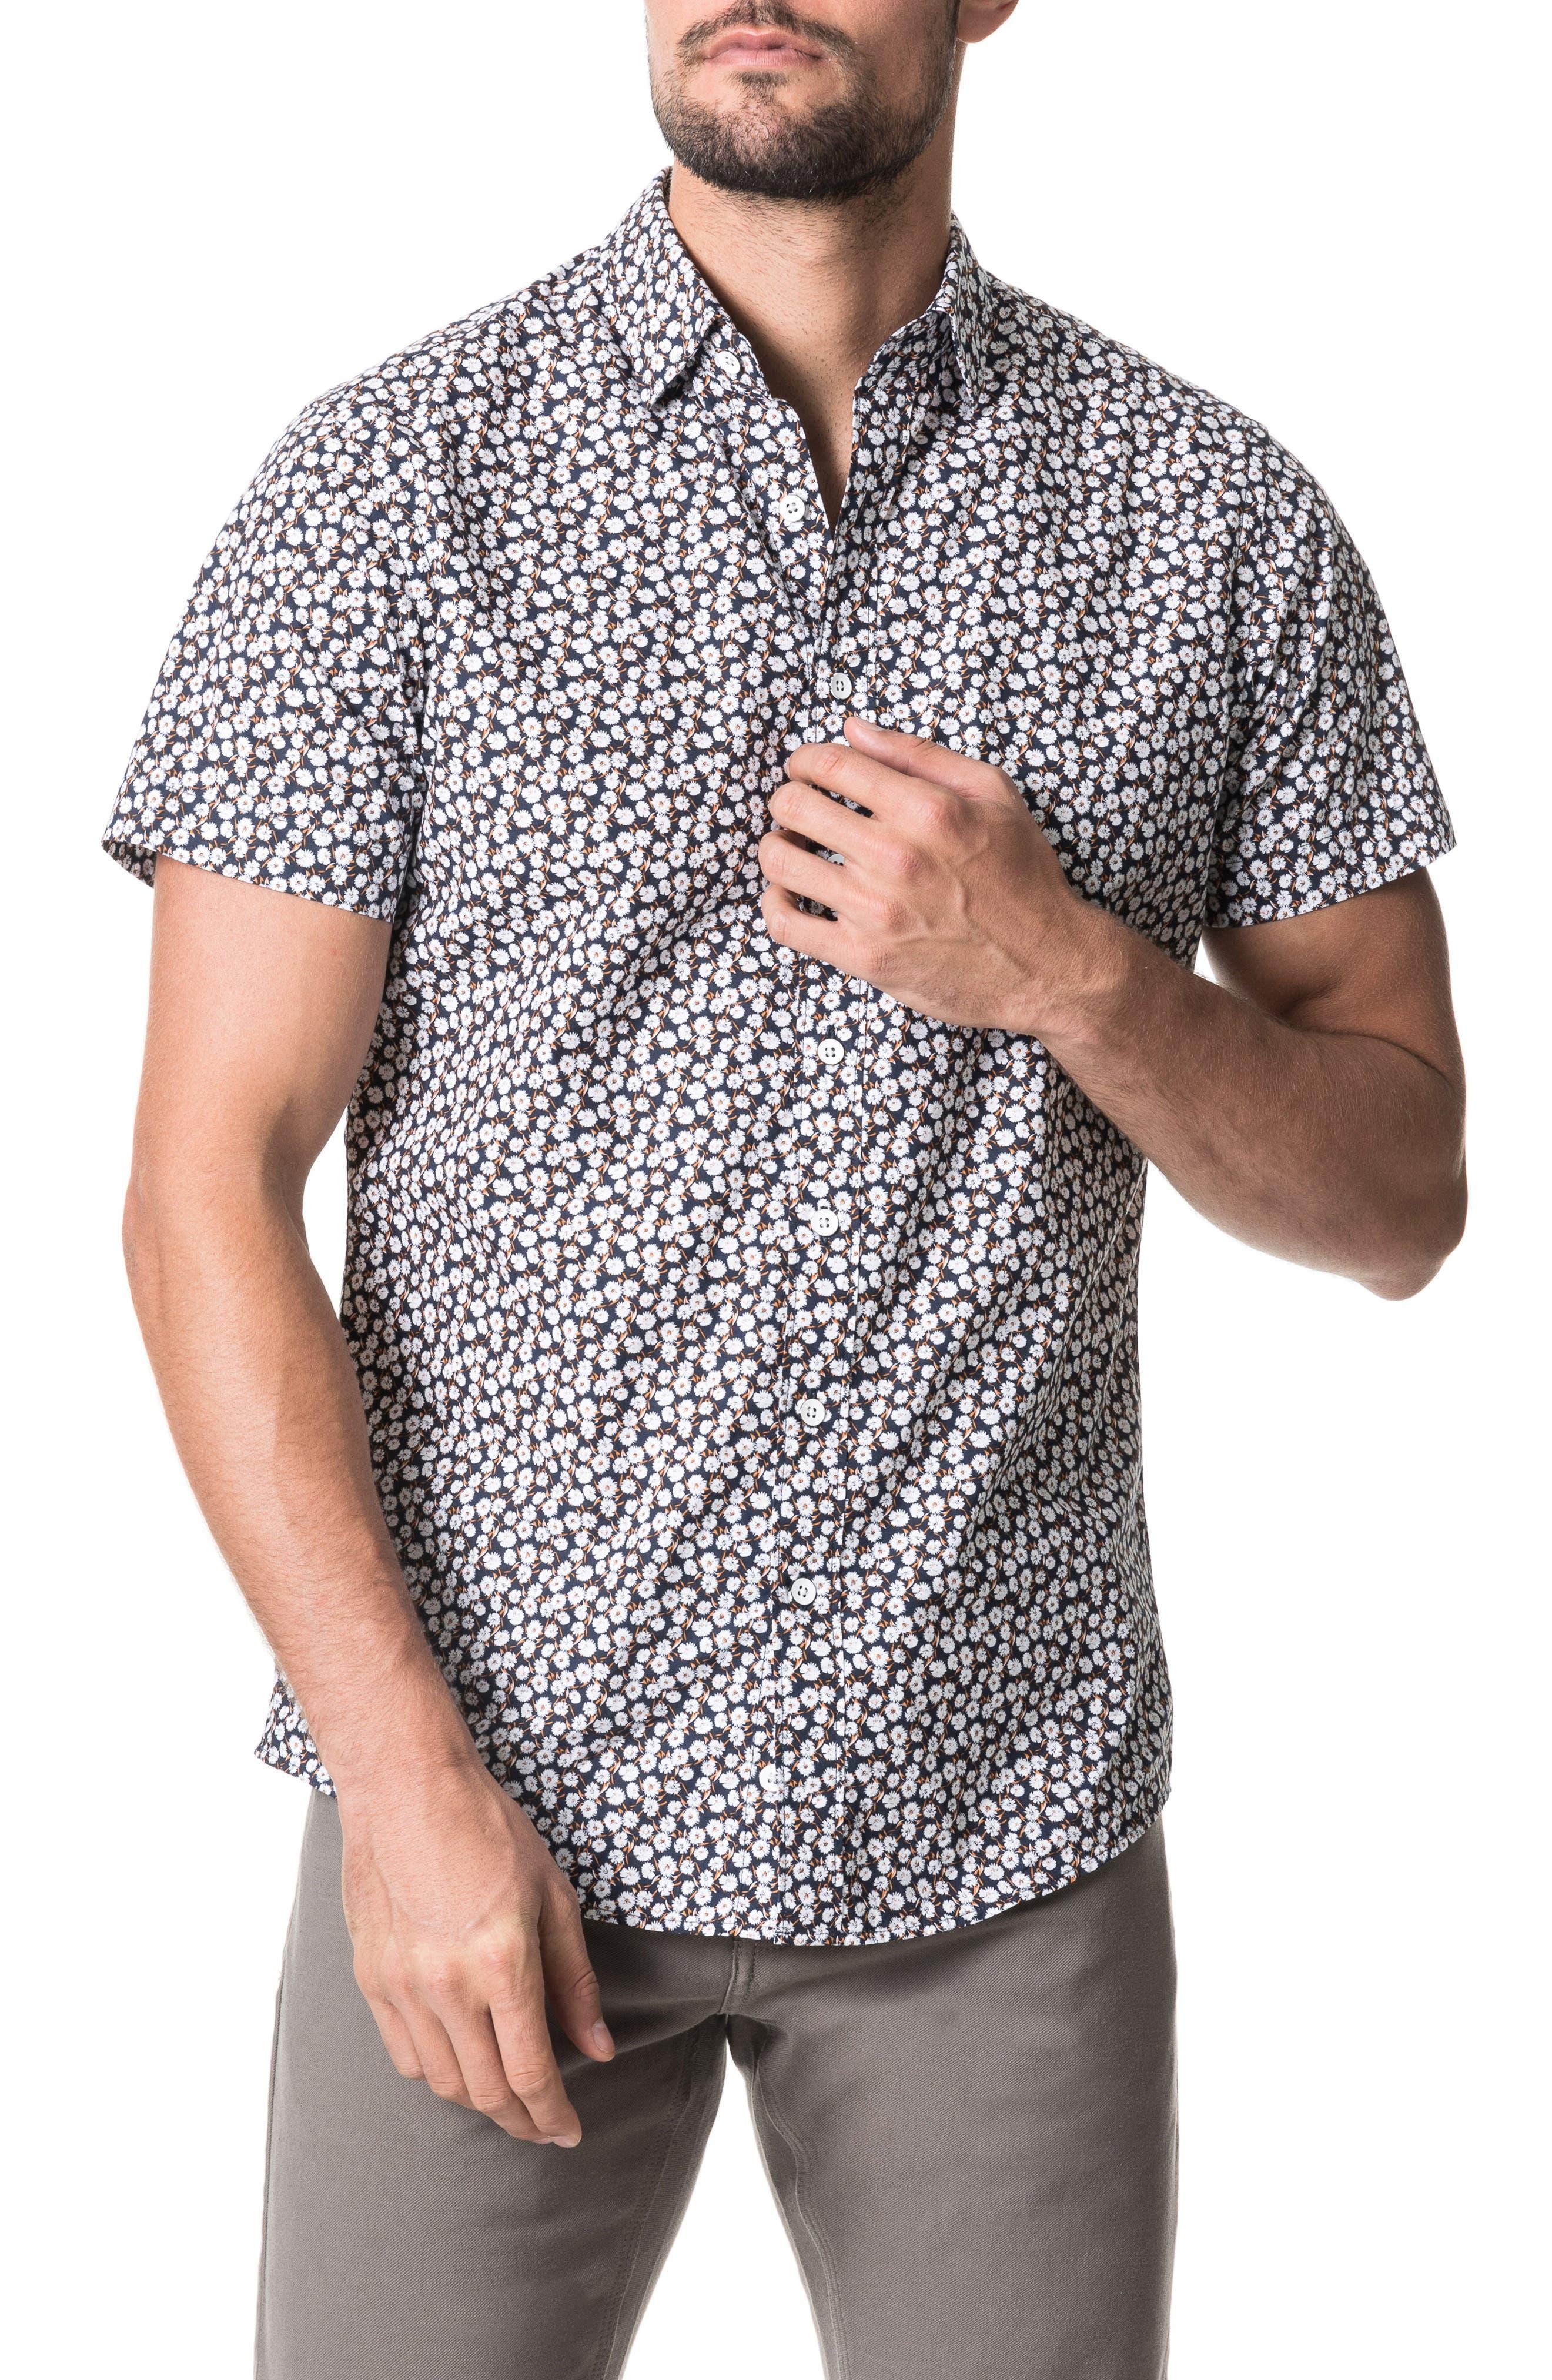 Image of RODD AND GUNN Midnight Daisy Print Short Sleeve Button-Up Shirt